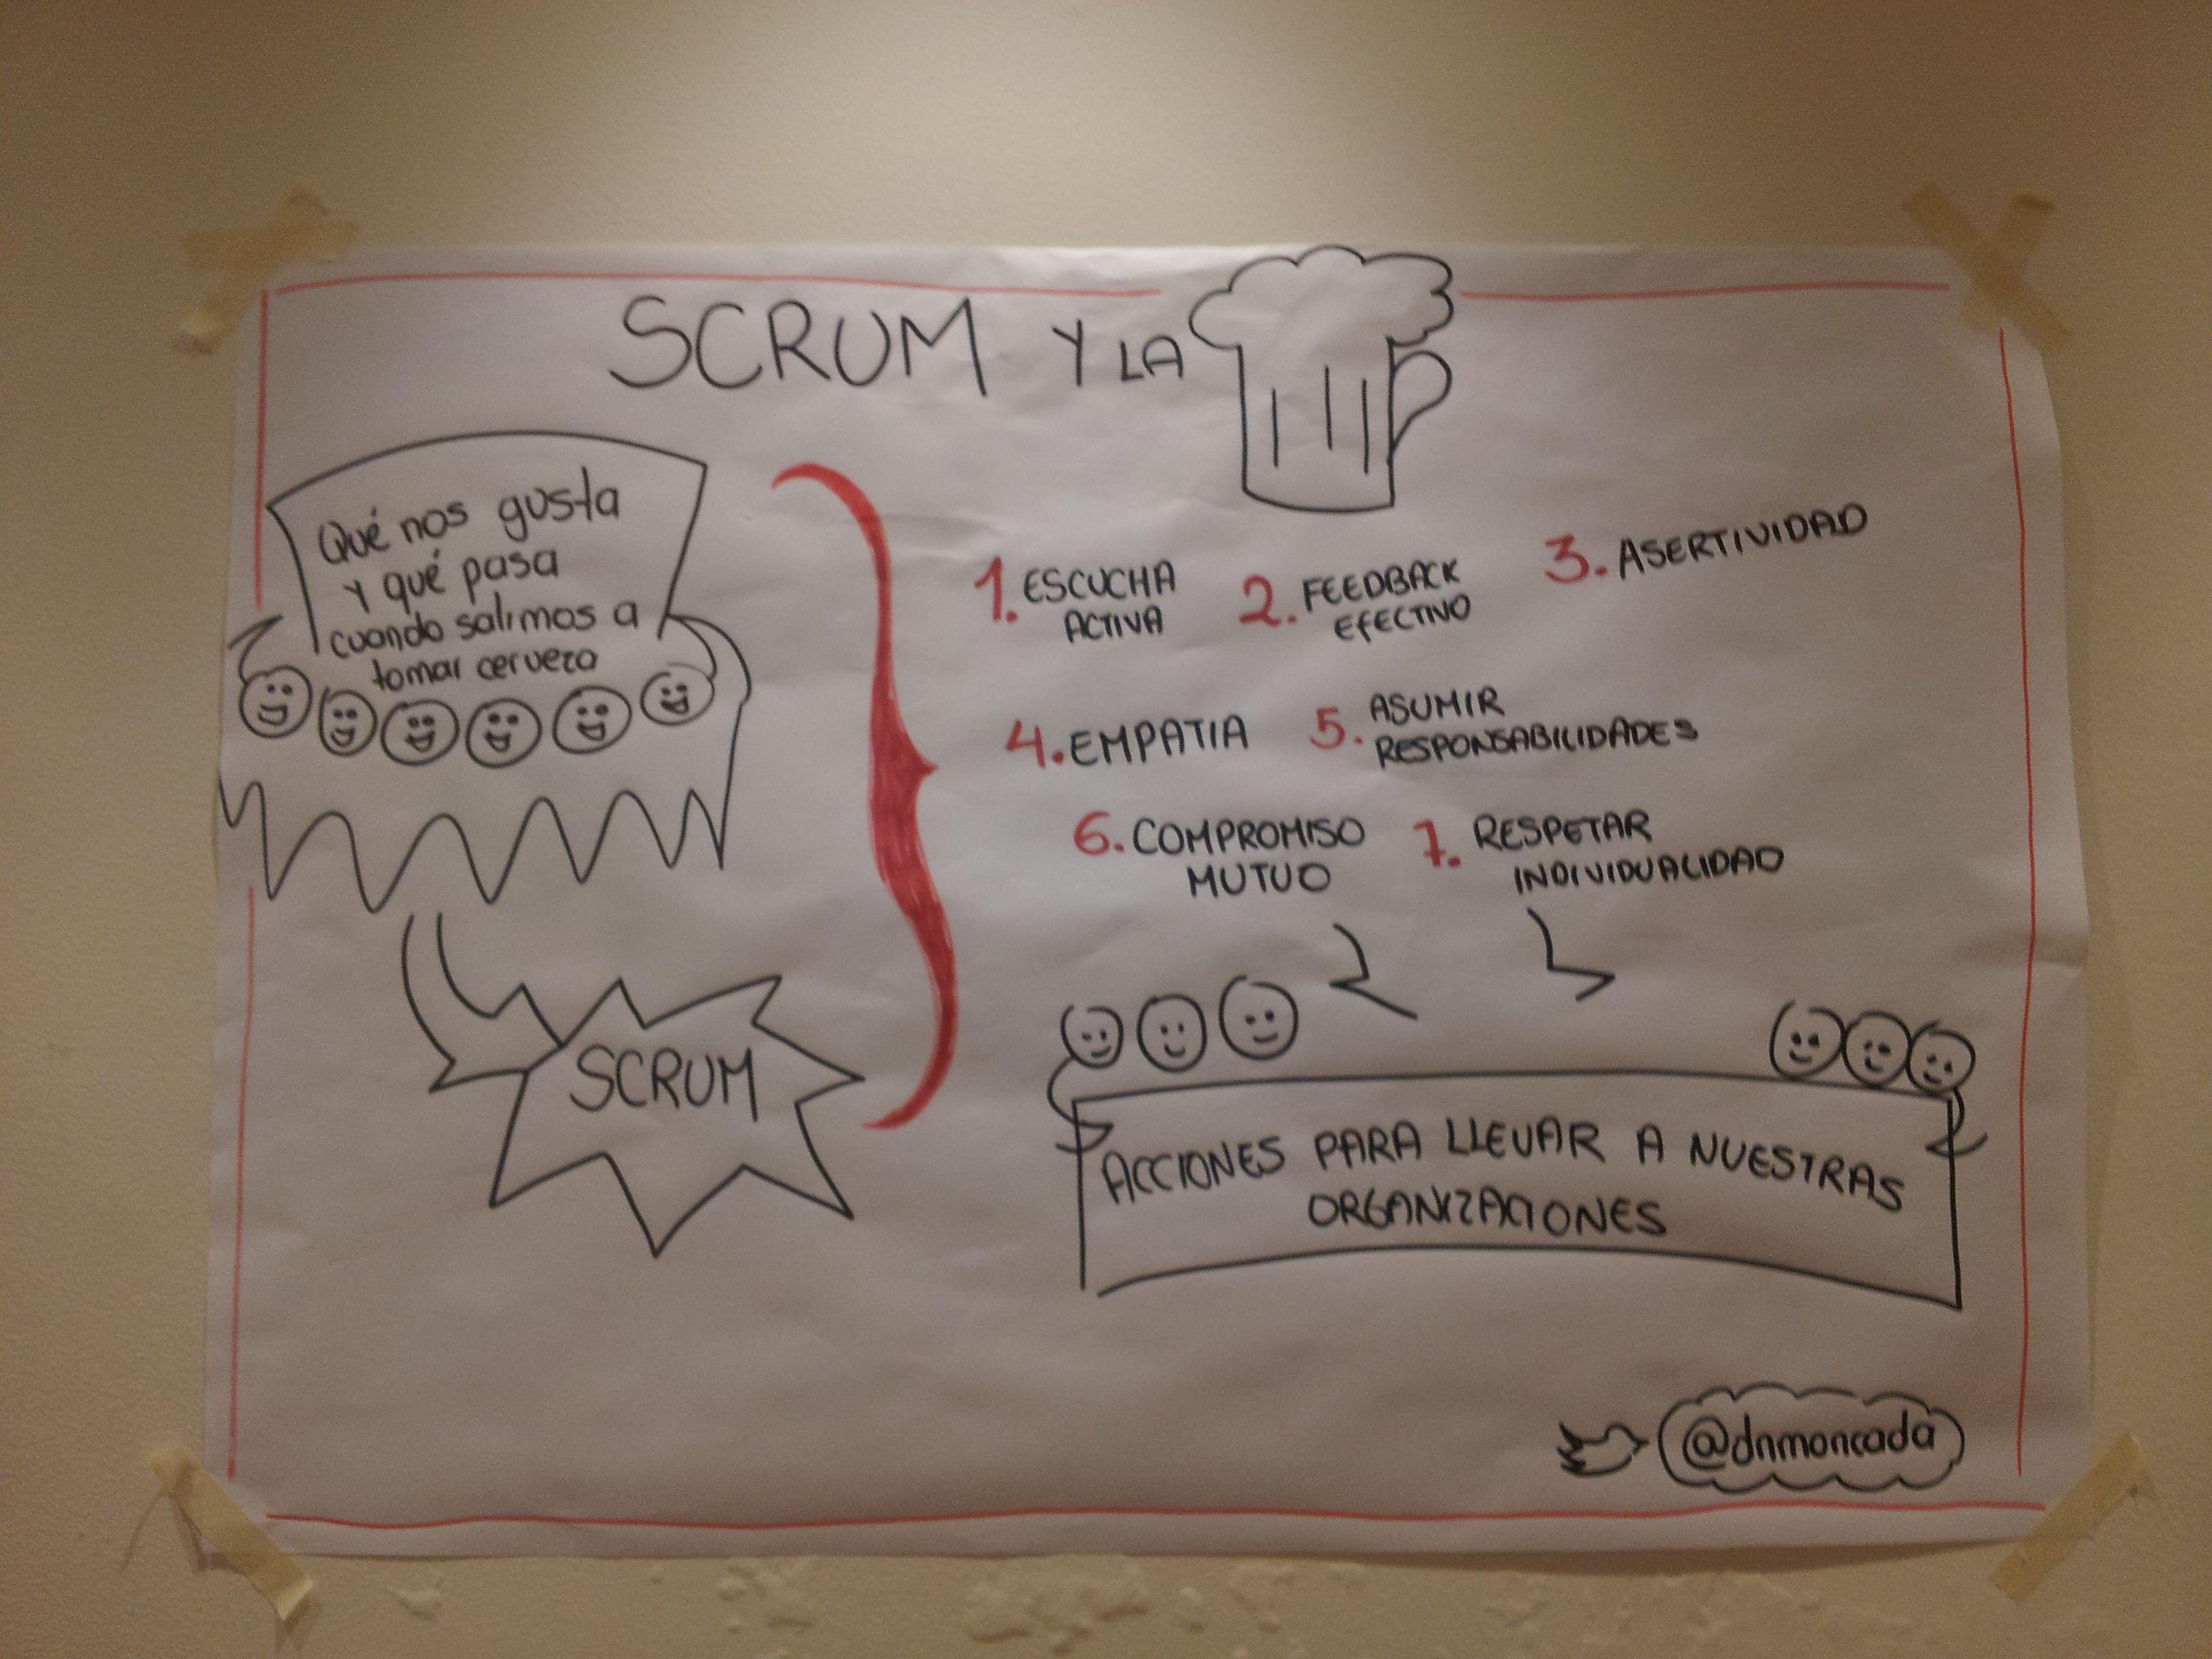 Scrum y la cerveza #DanielMoncada #FacilitacionGrafica #Agiles2014 #agile #agil